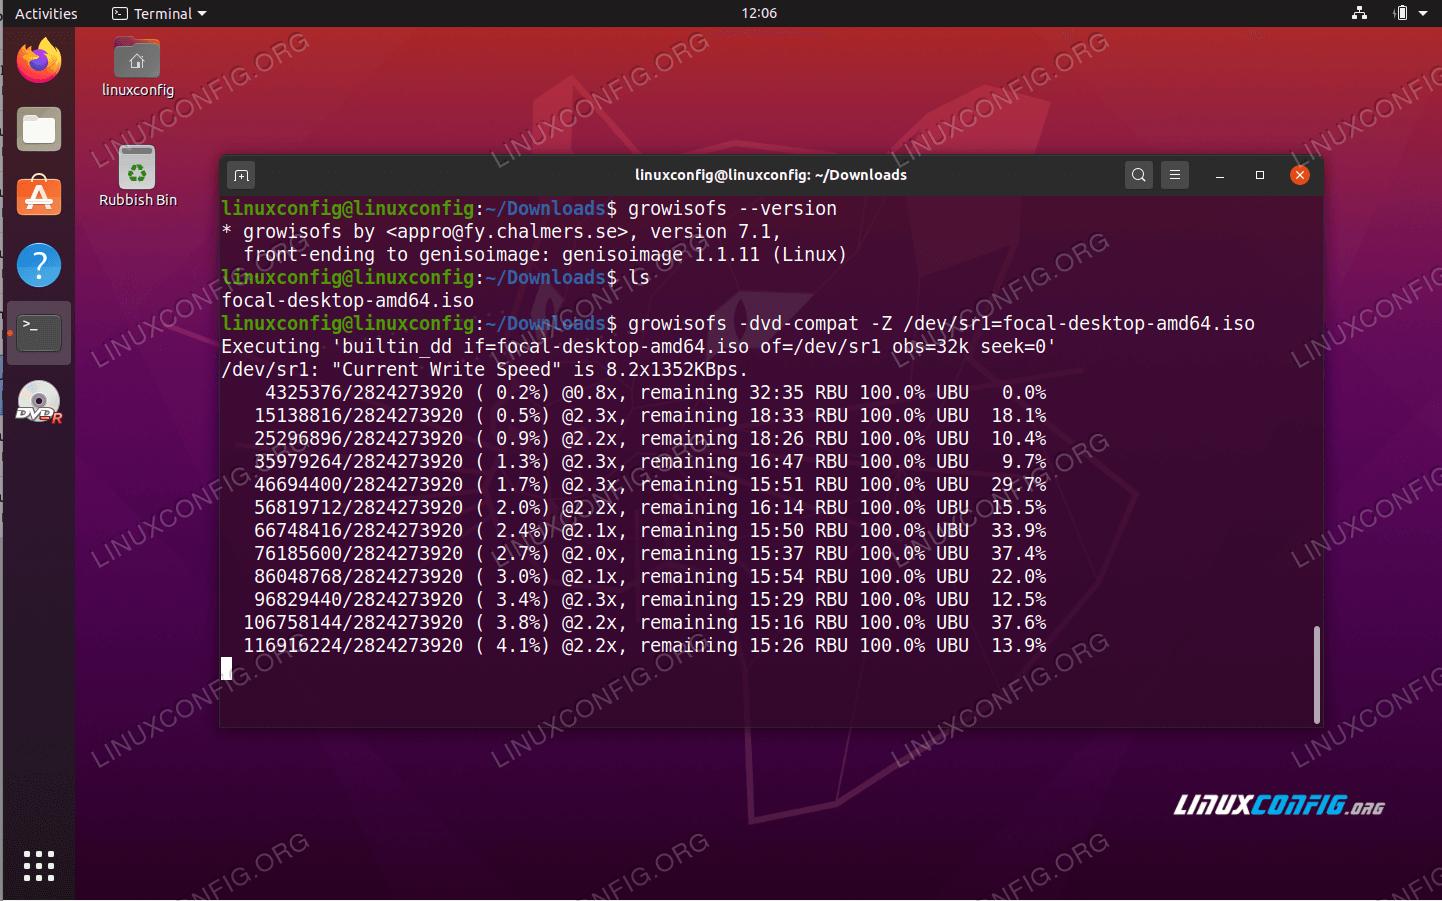 Ubuntu 20.04 Burn ISO to DVD from command line